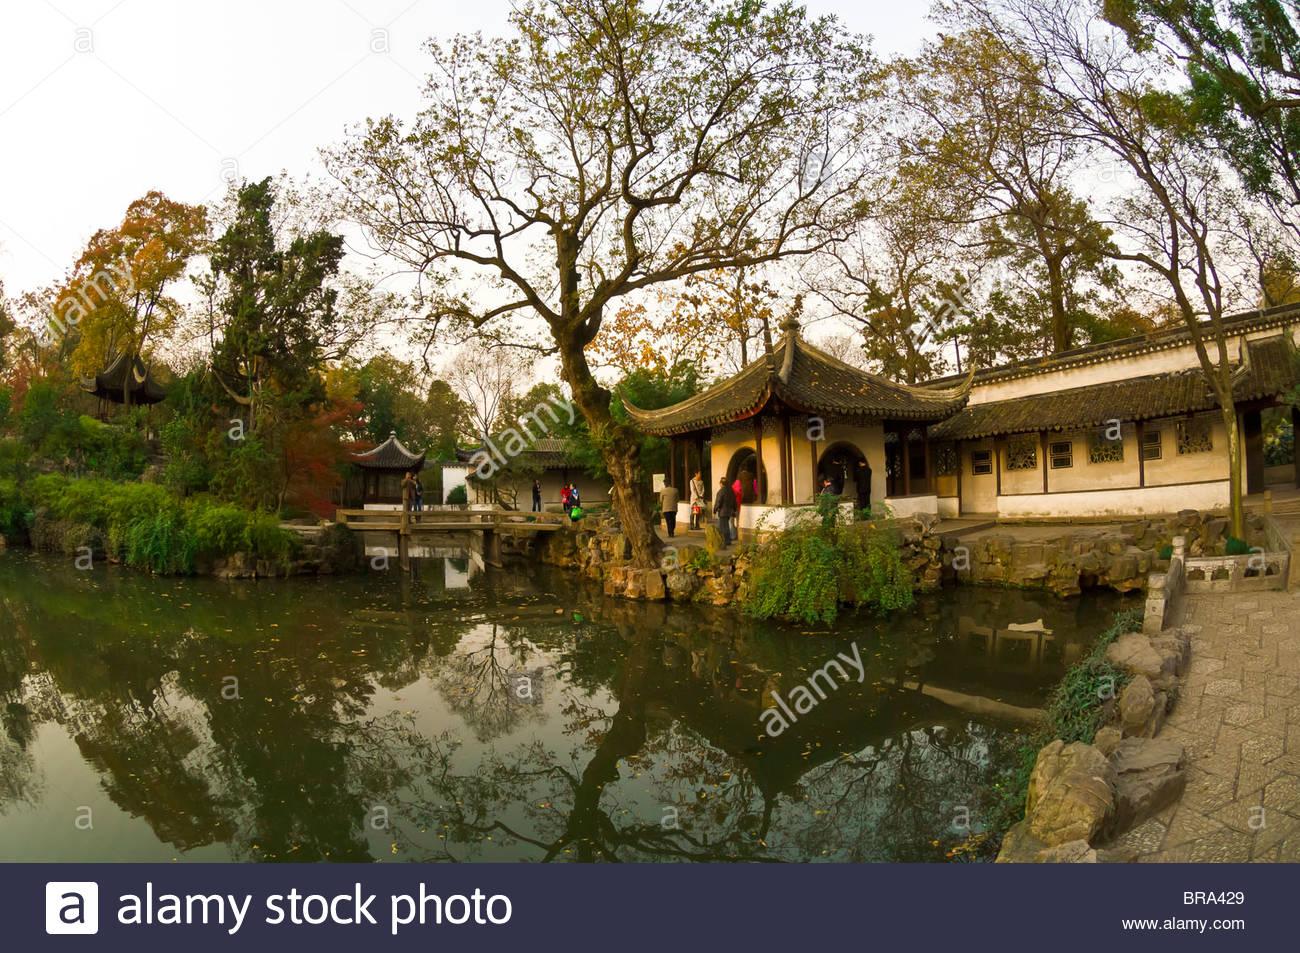 Jardín del Administrador Humilde, Suzhou, China Imagen De Stock